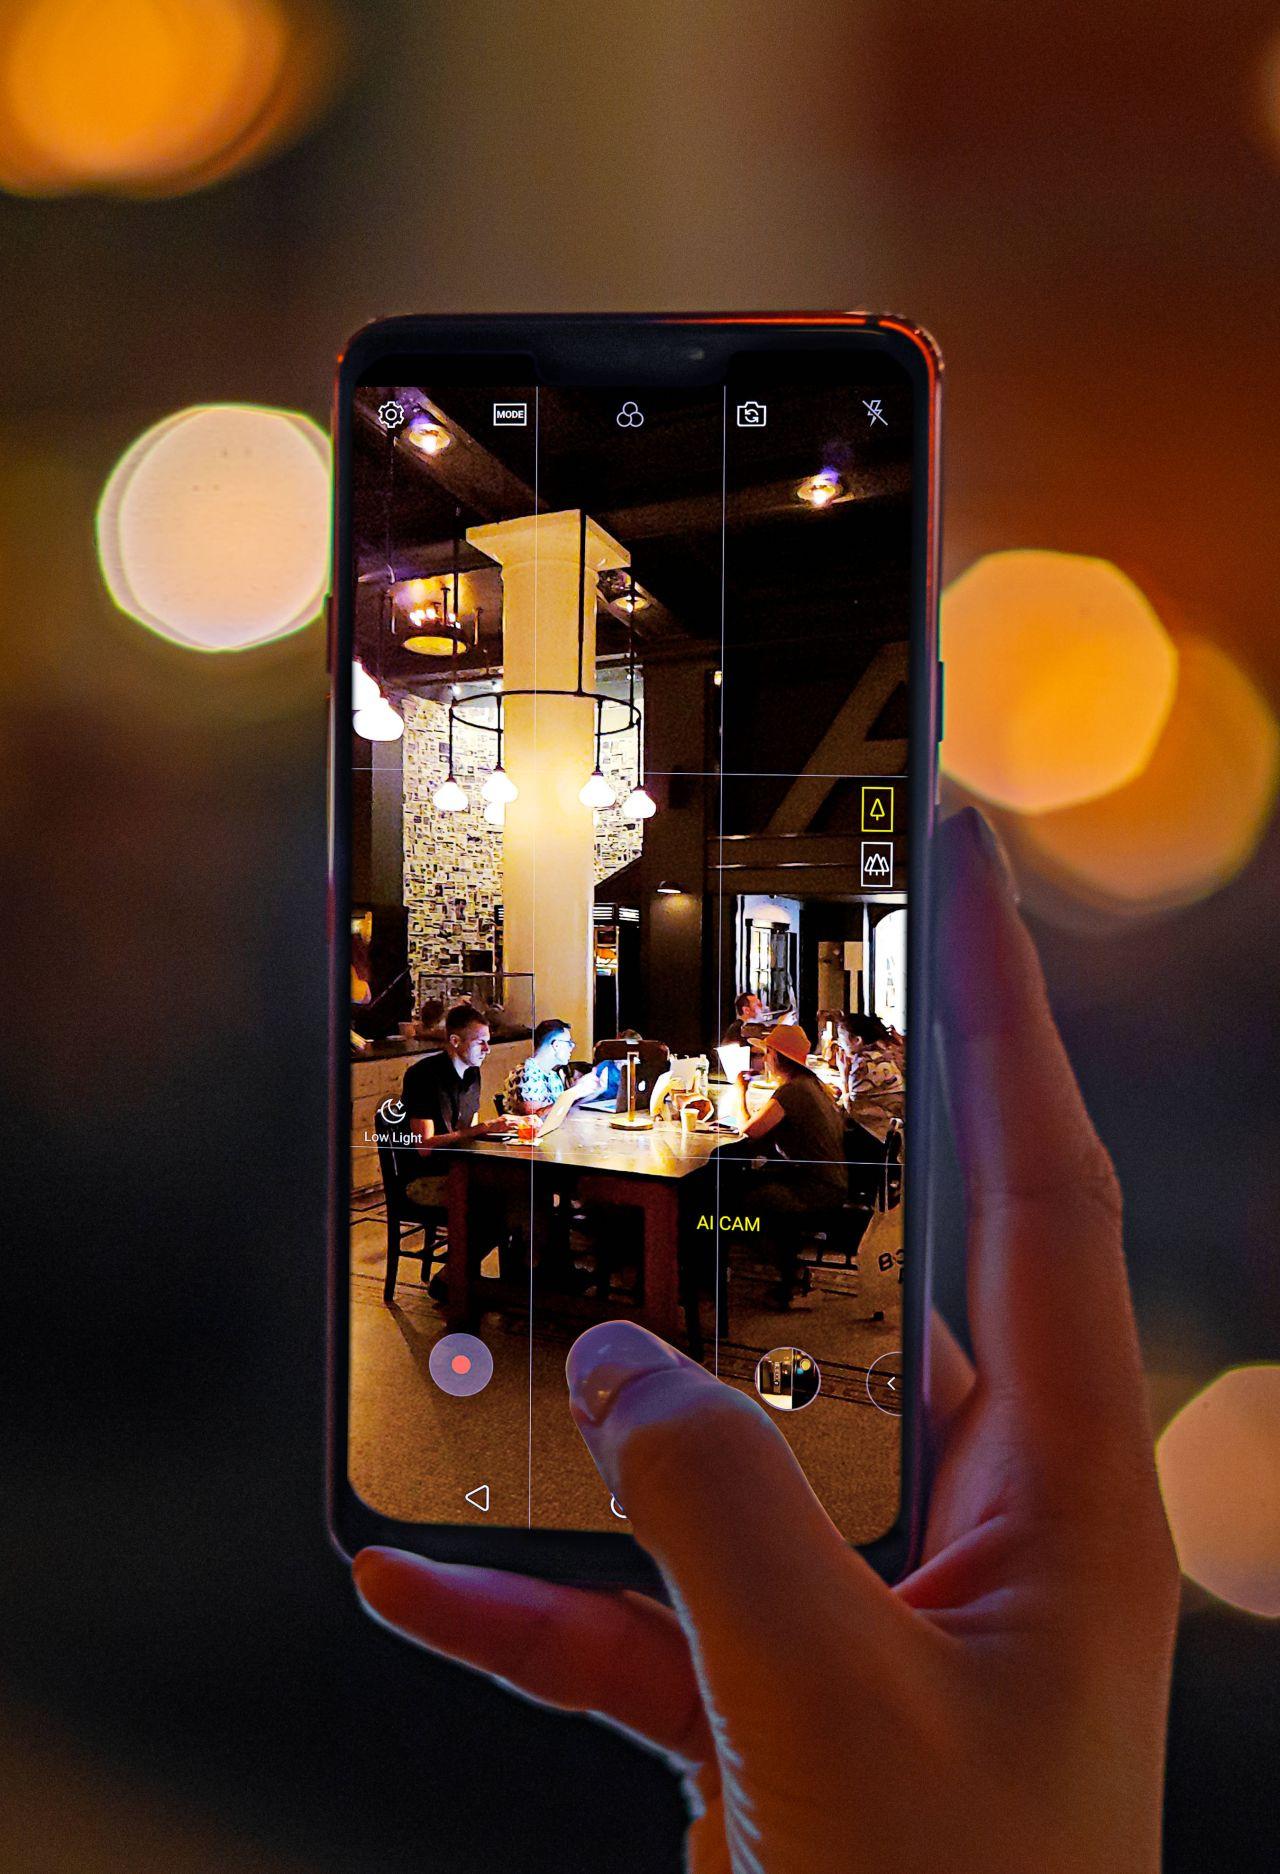 LG G7 ThinQ'in yeni görselleri - 2 - Page 4